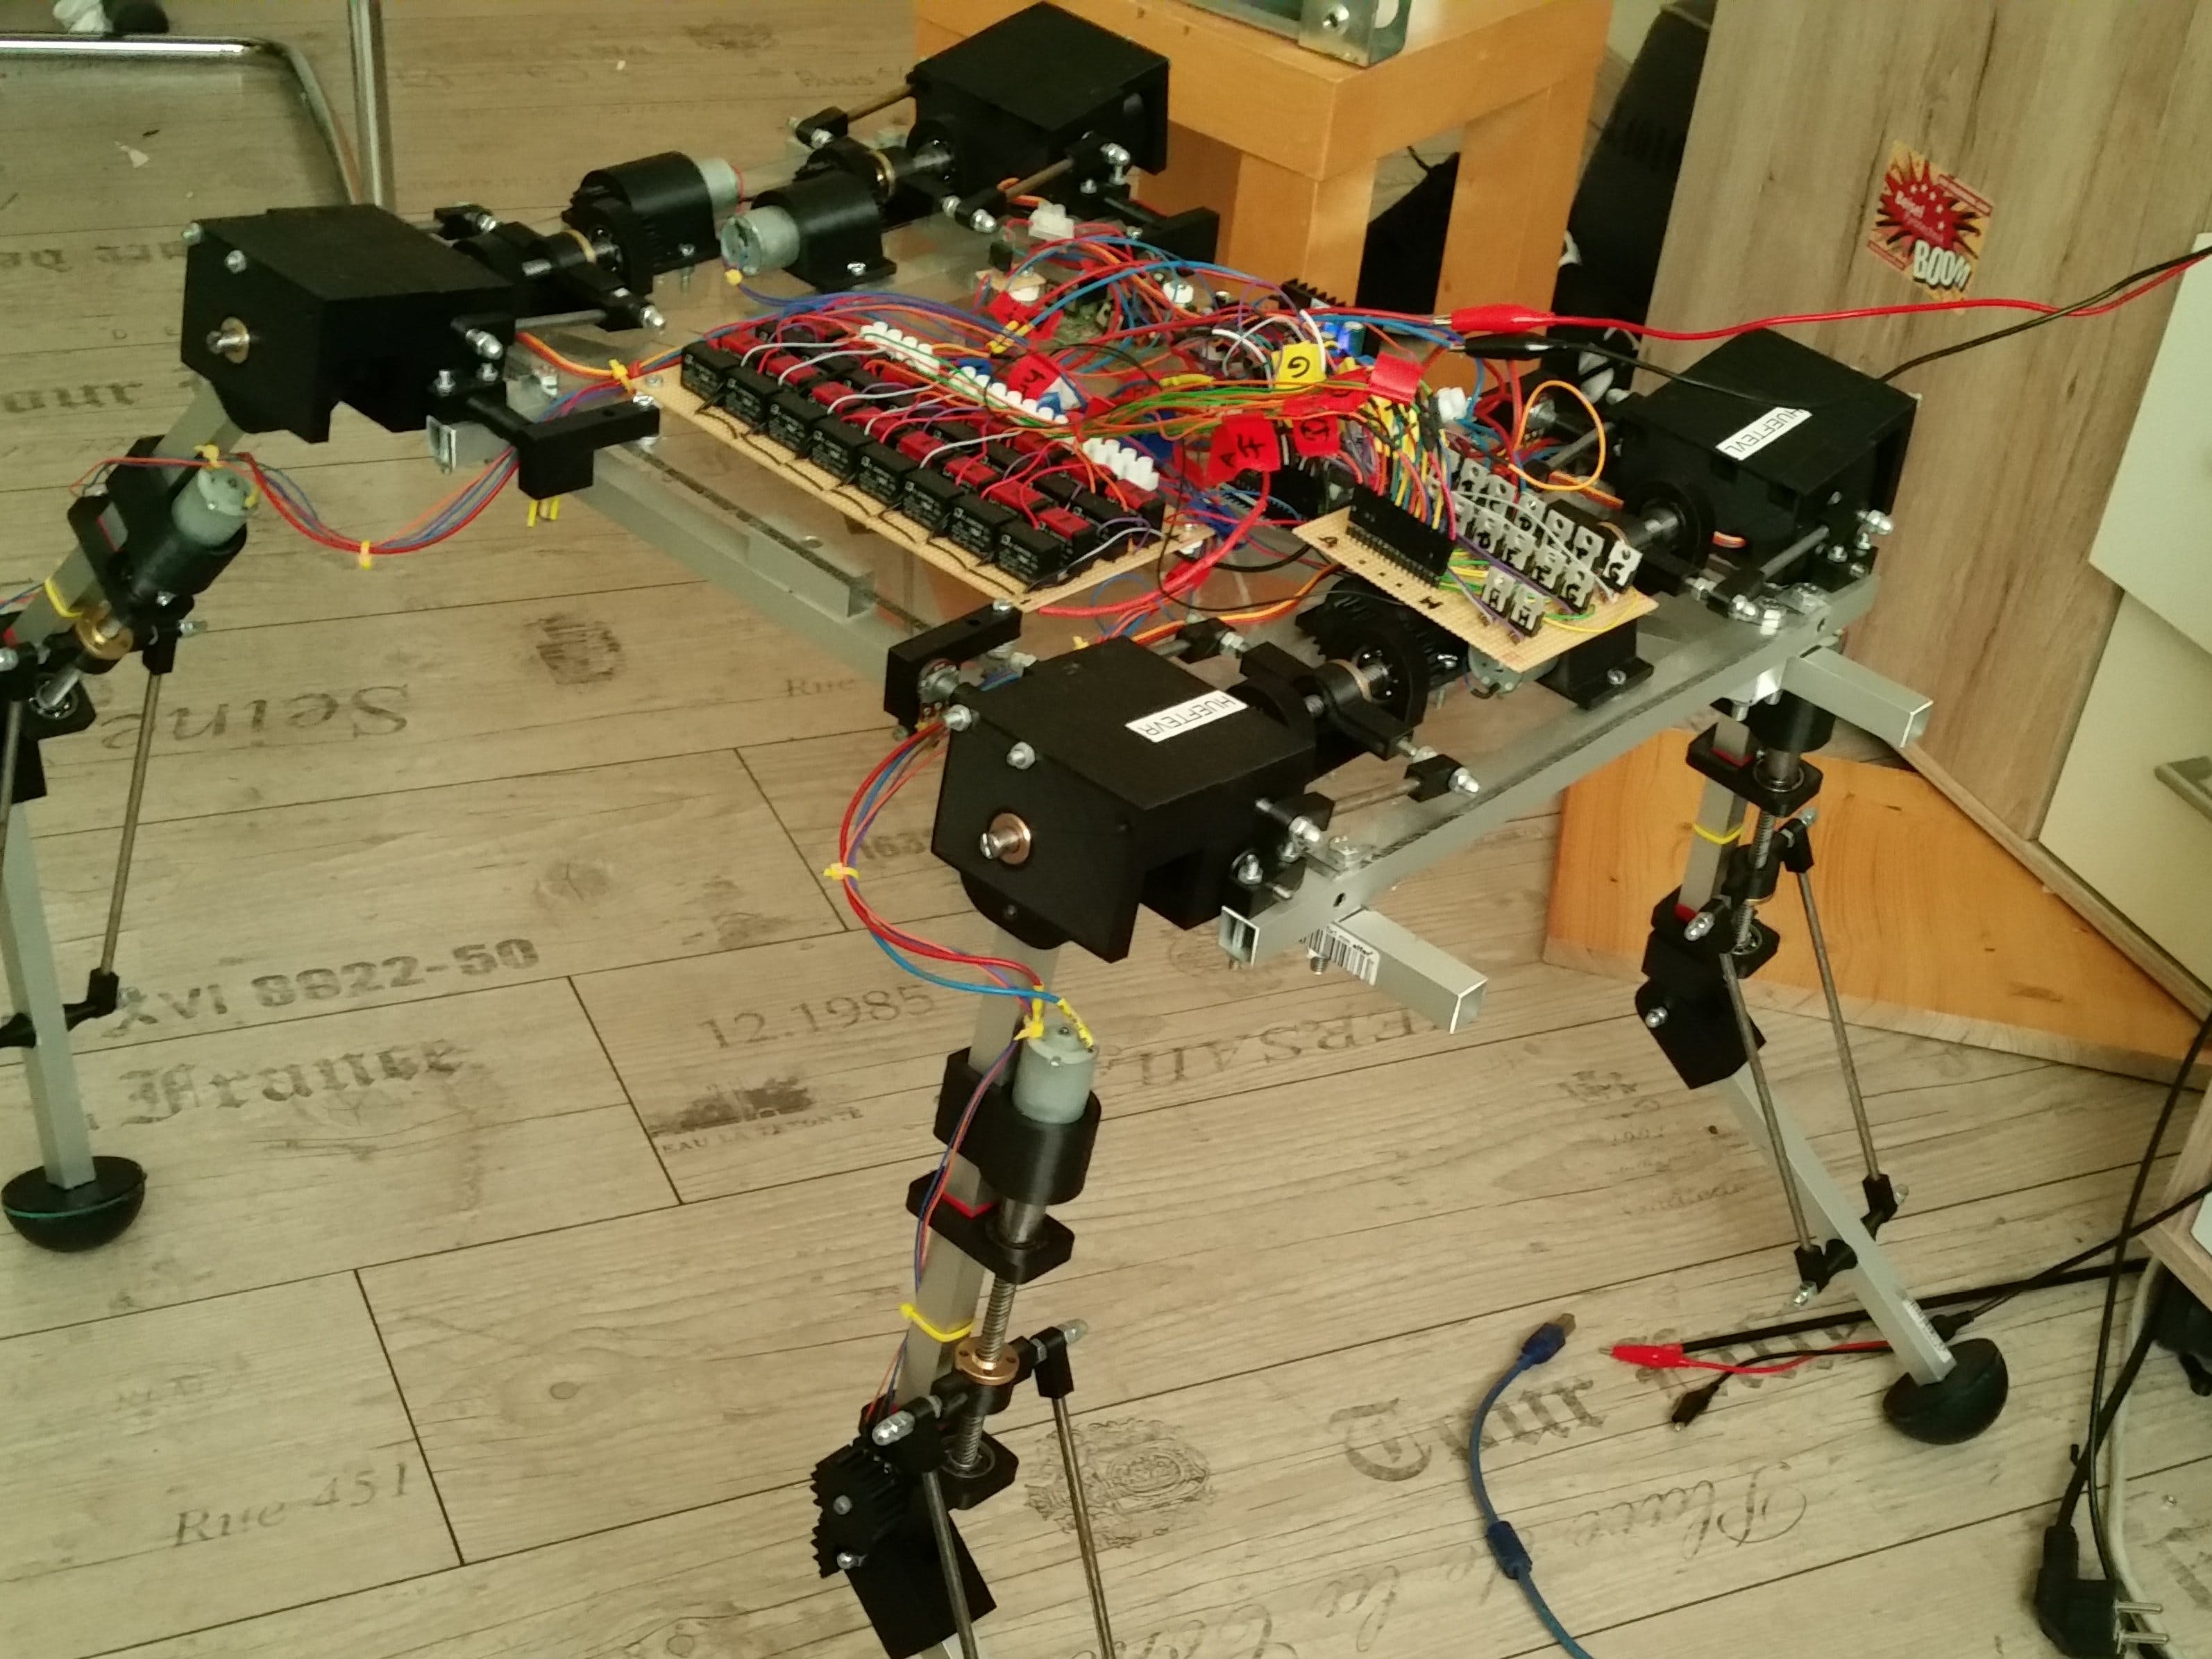 Project ZERBERUS - Robotic Dog